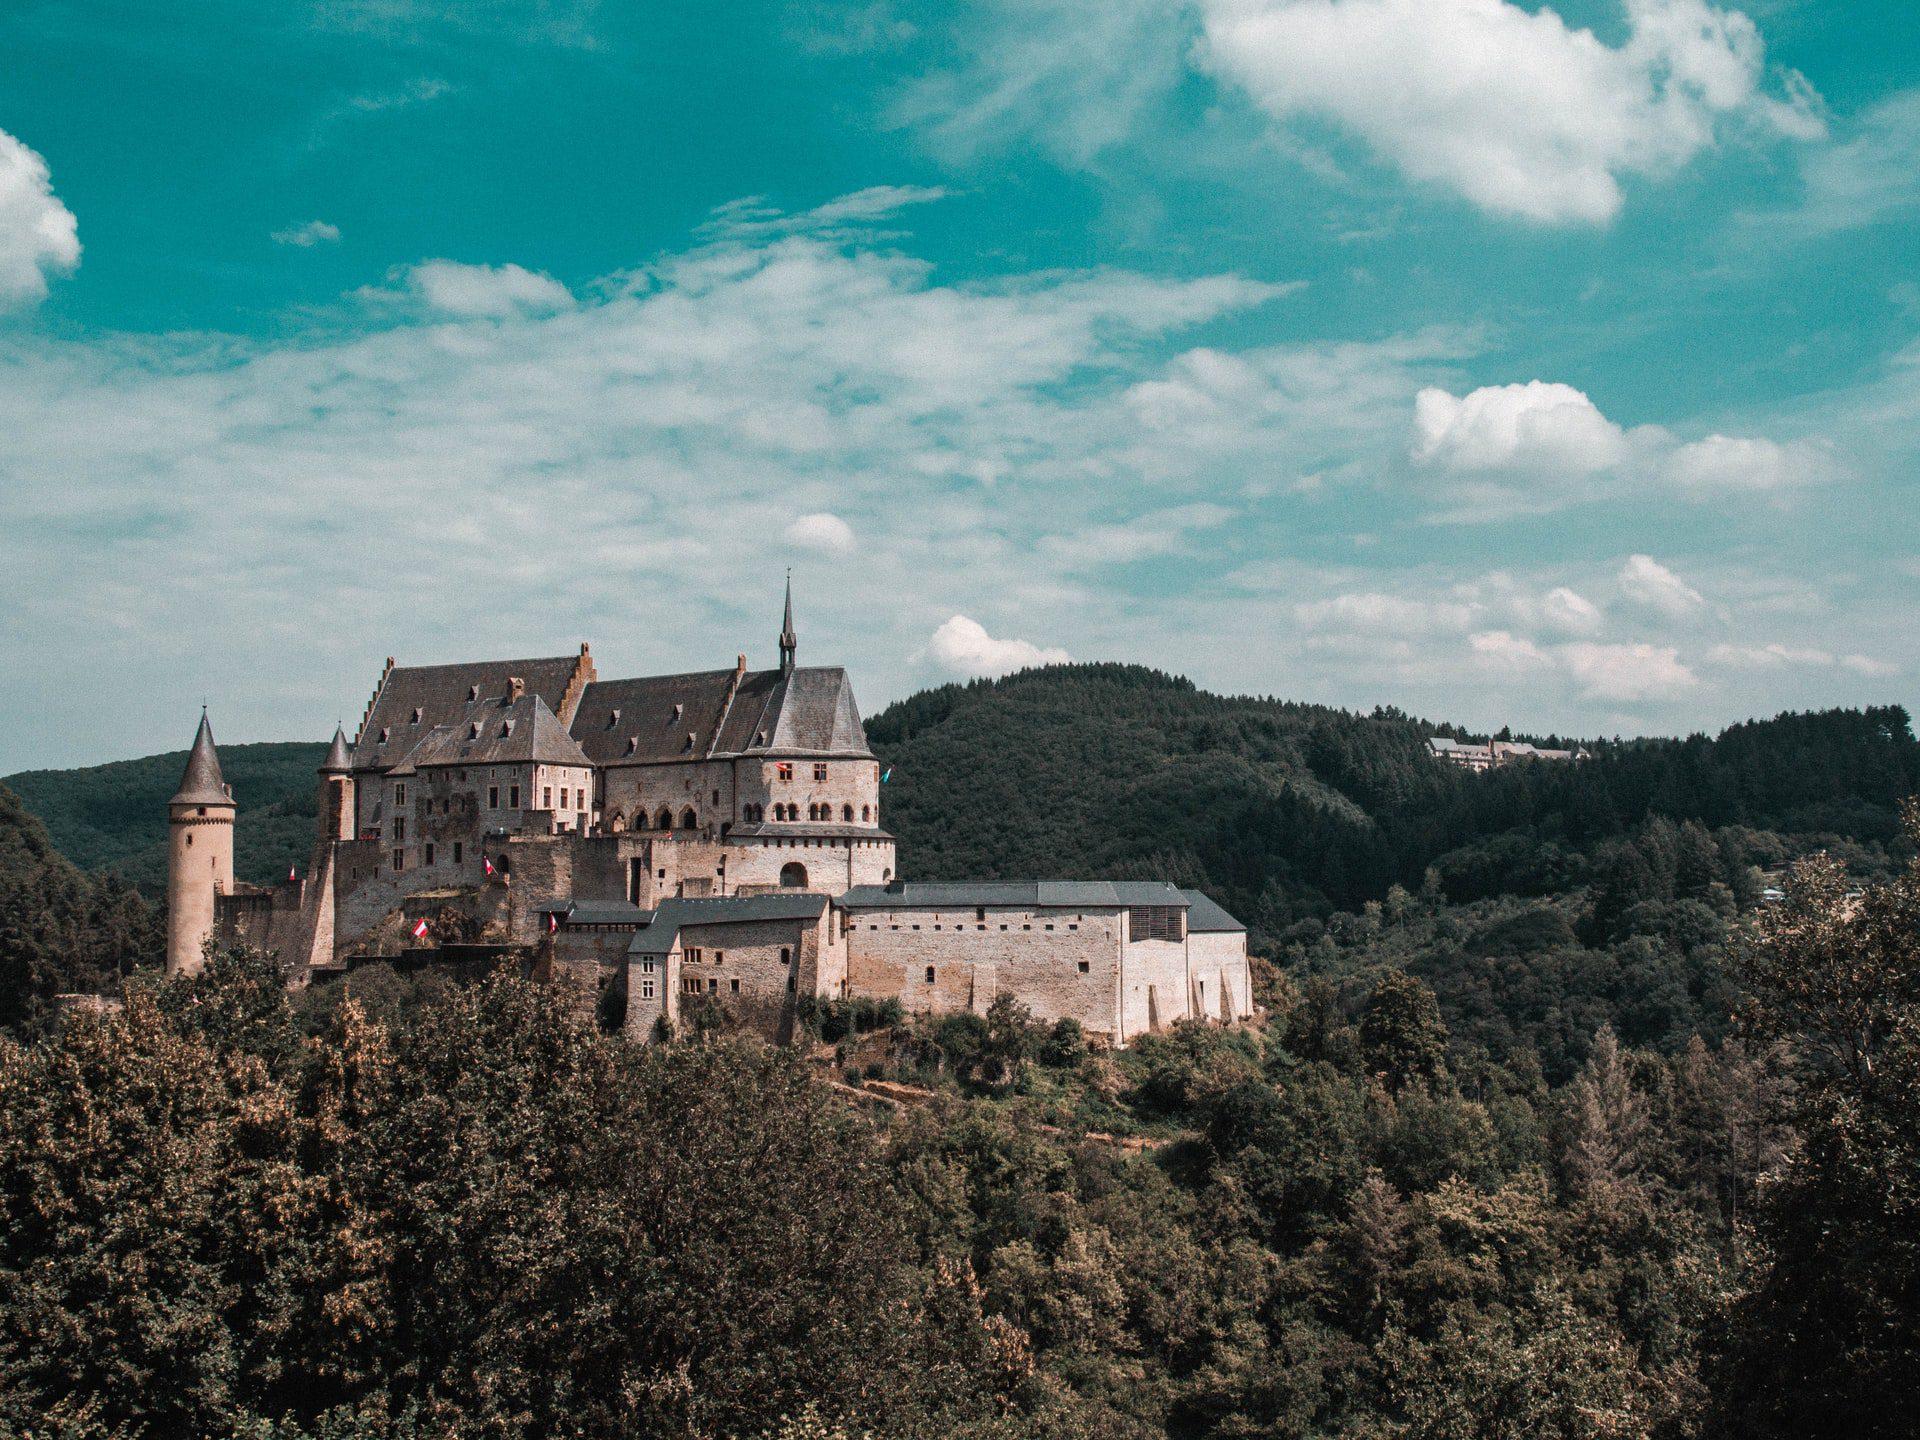 Enchanting Luxembourg